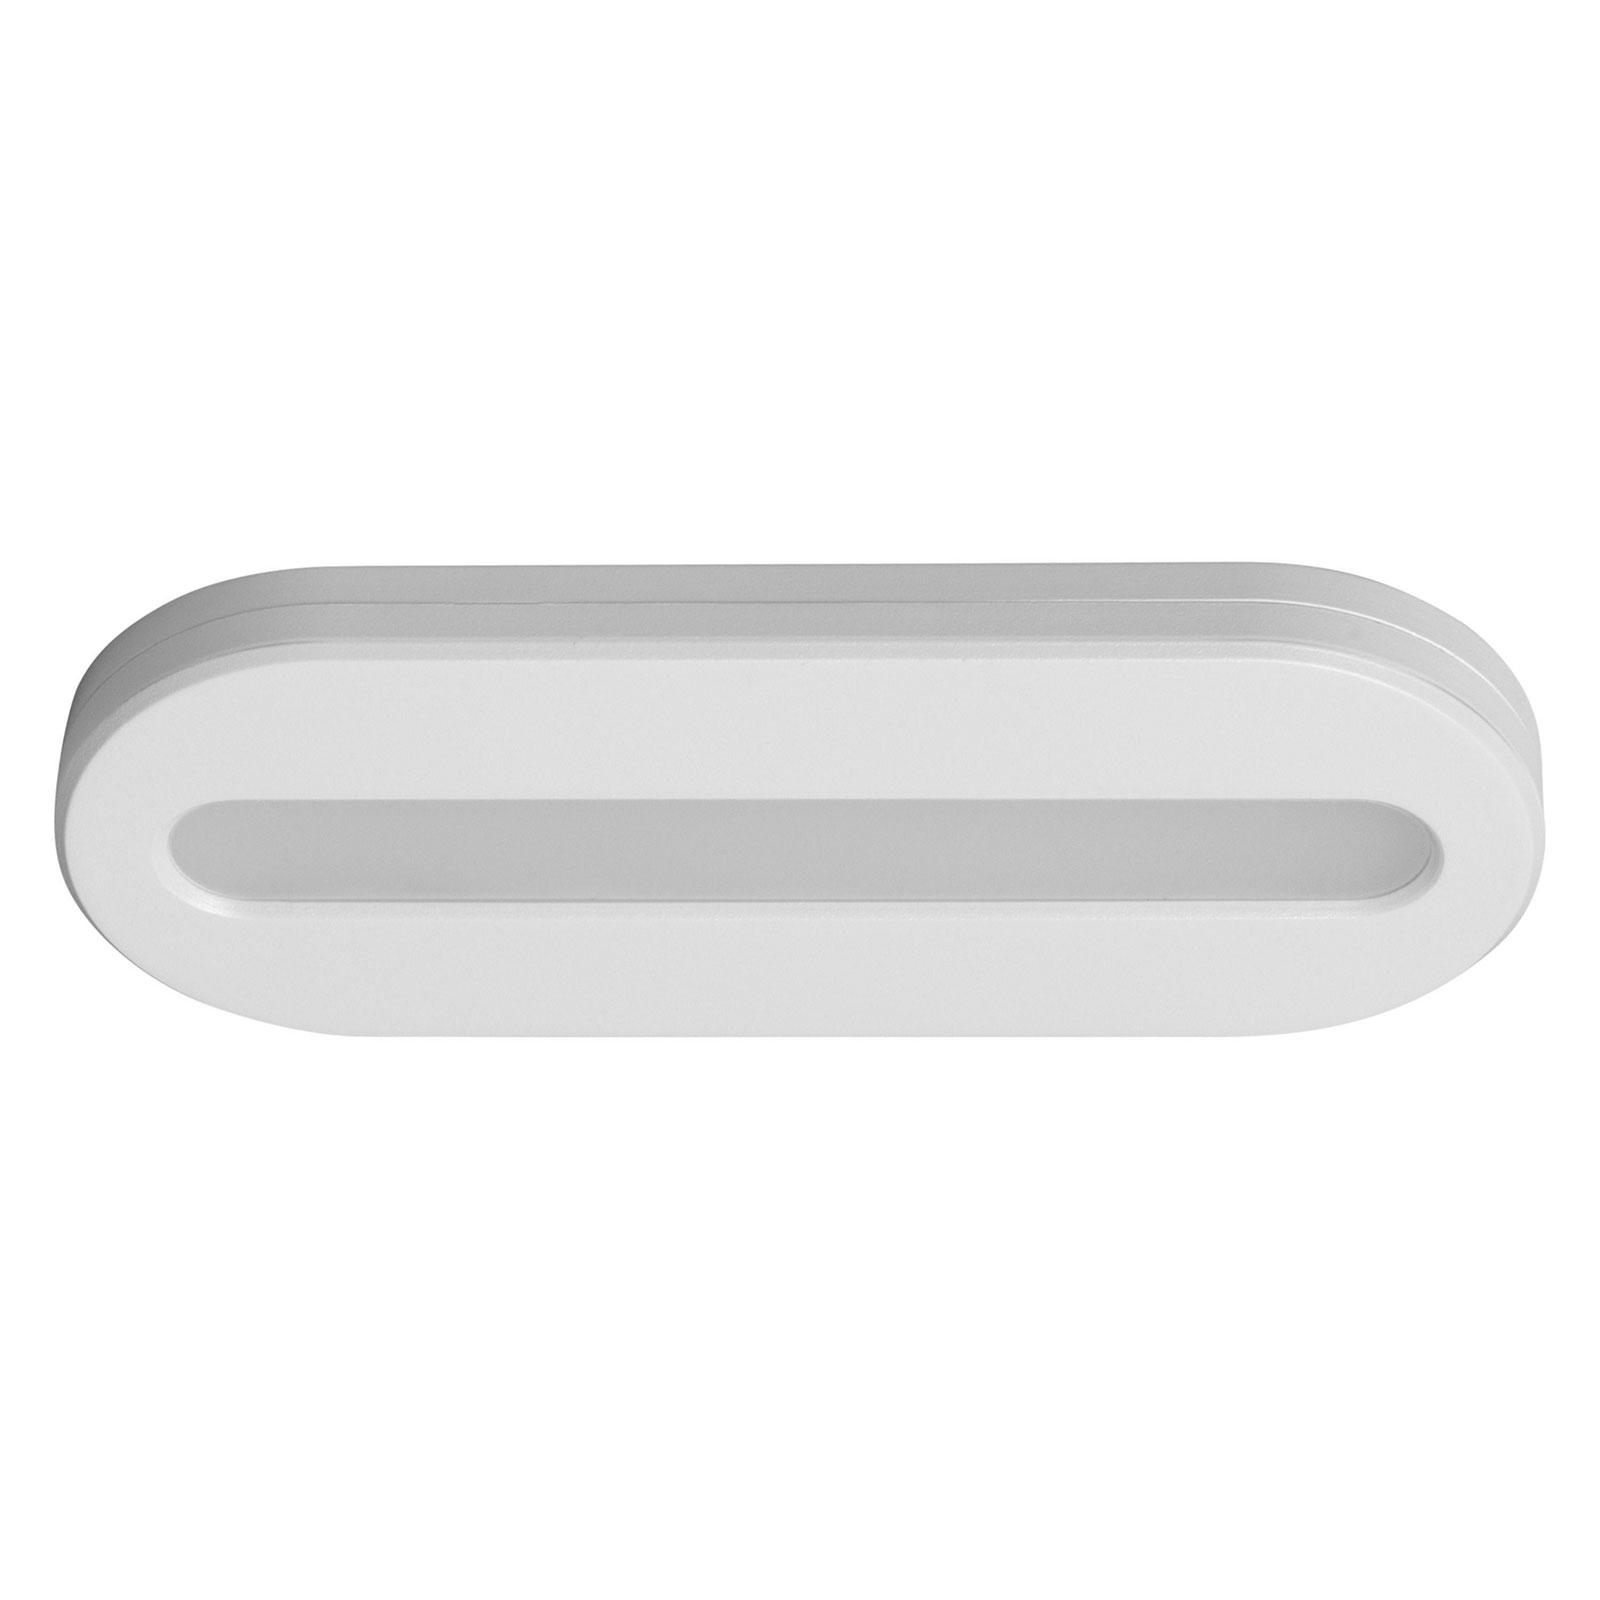 LEDVANCE Linear Mobile -kaapinalusvalo USB Sensor